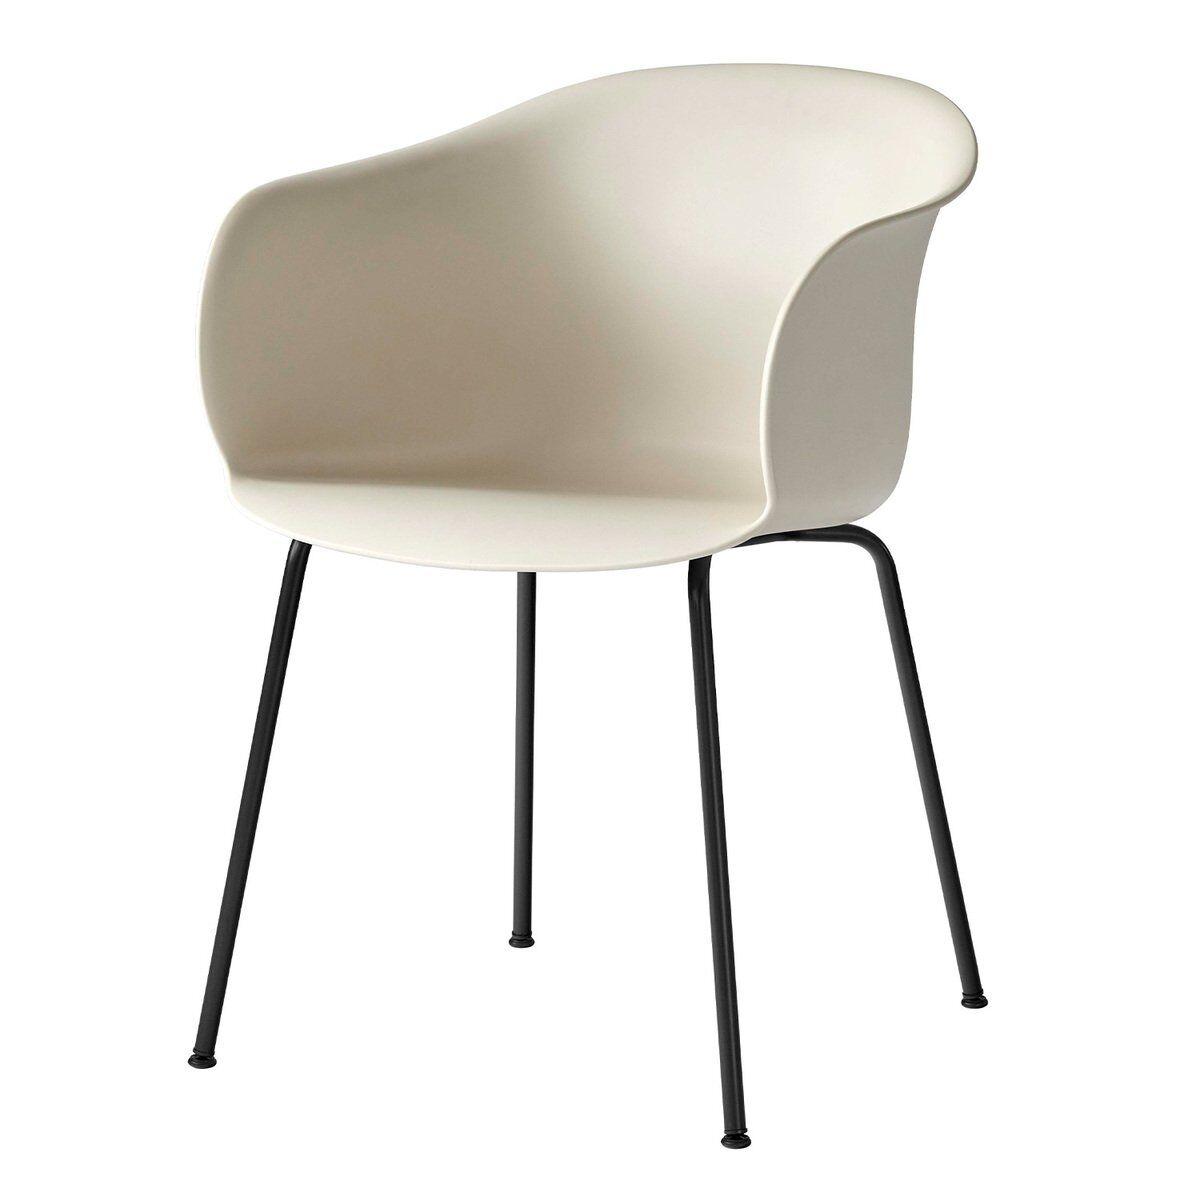 &Tradition Elefy JH28 tuoli, soft beige - musta